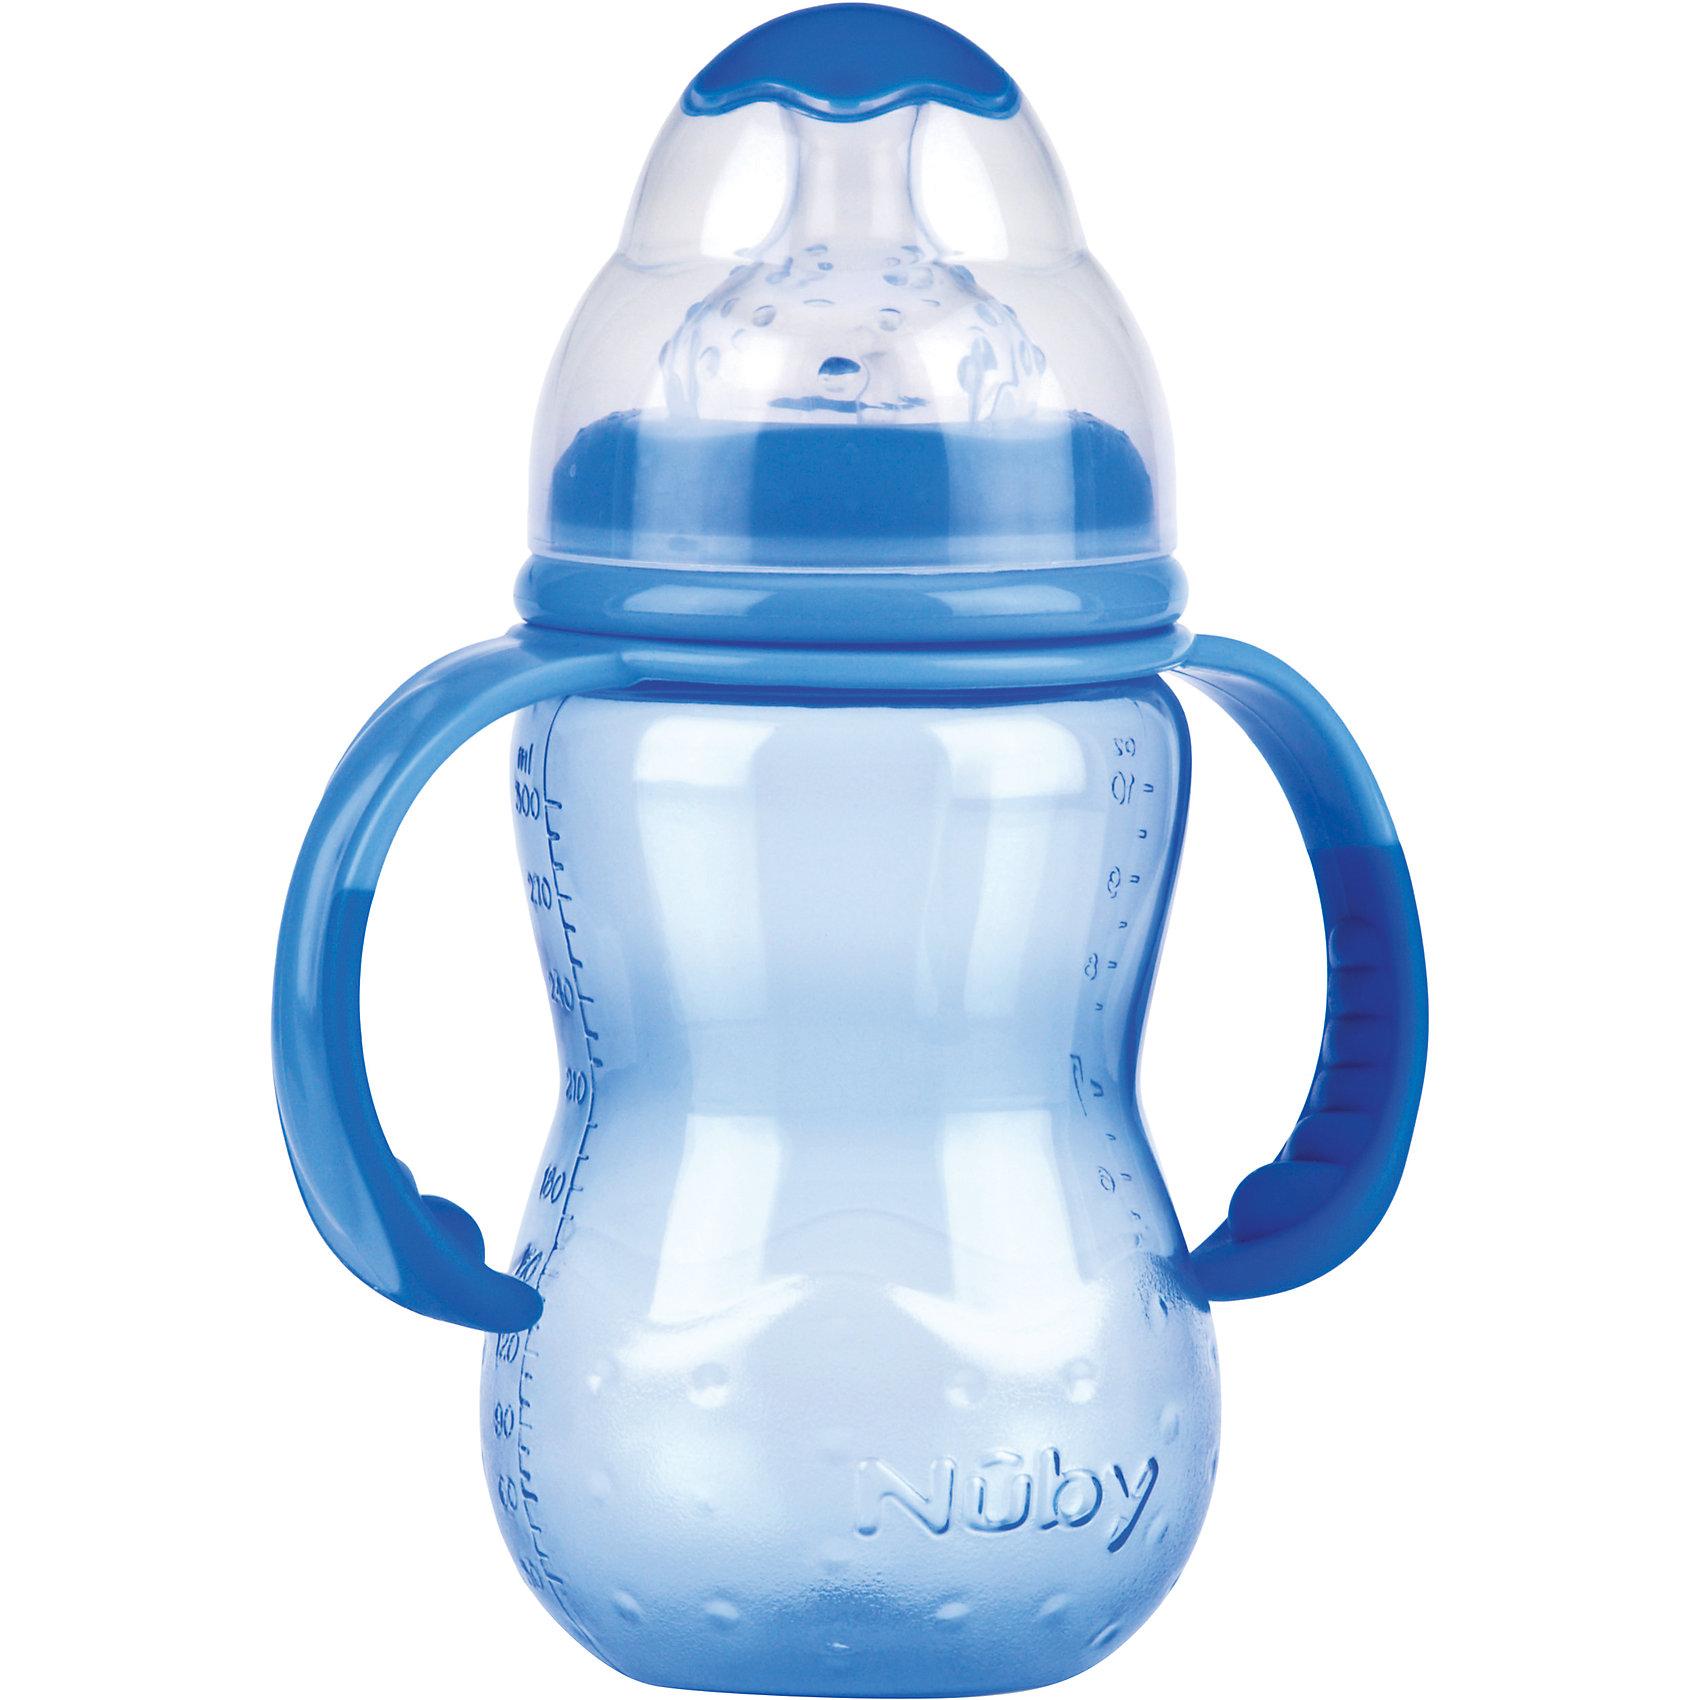 Бутылочка с широким горлом, Nuby, 300 мл., голубой